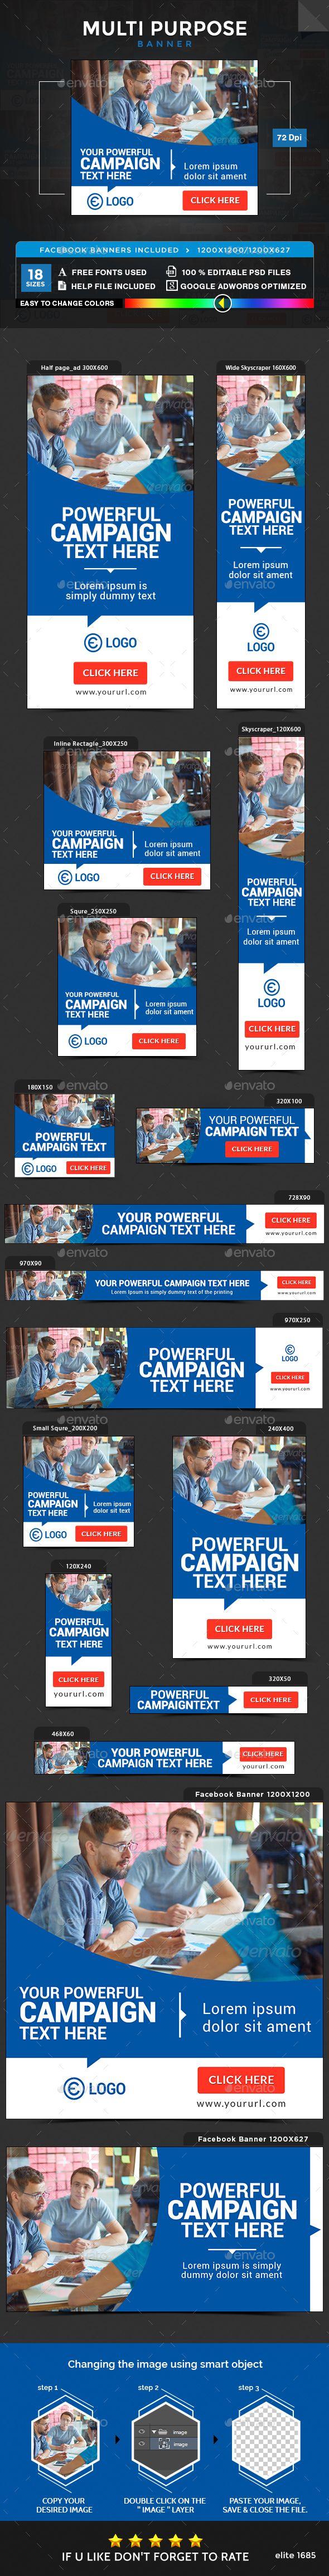 Multipurpose Banners Template PSD. Download here: https://graphicriver.net/item/multipurpose-banners/17262686?ref=ksioks